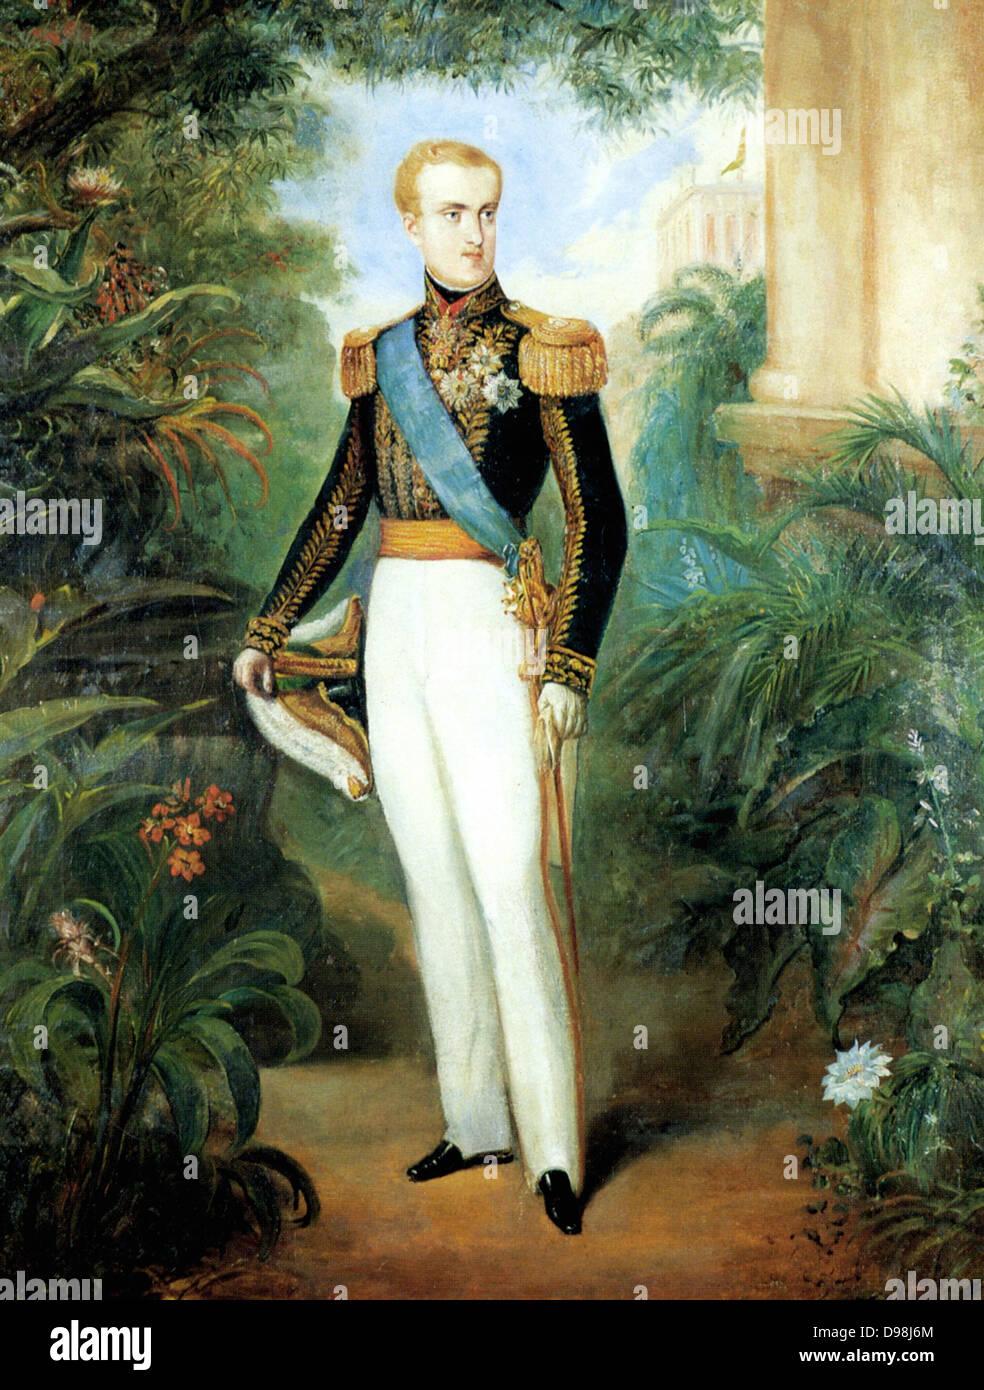 Pedro II (English: Peter II; 2 December 1825 – 5 December 1891), Pedro II, at age 20 wearing court dress, 1846. - Stock Image